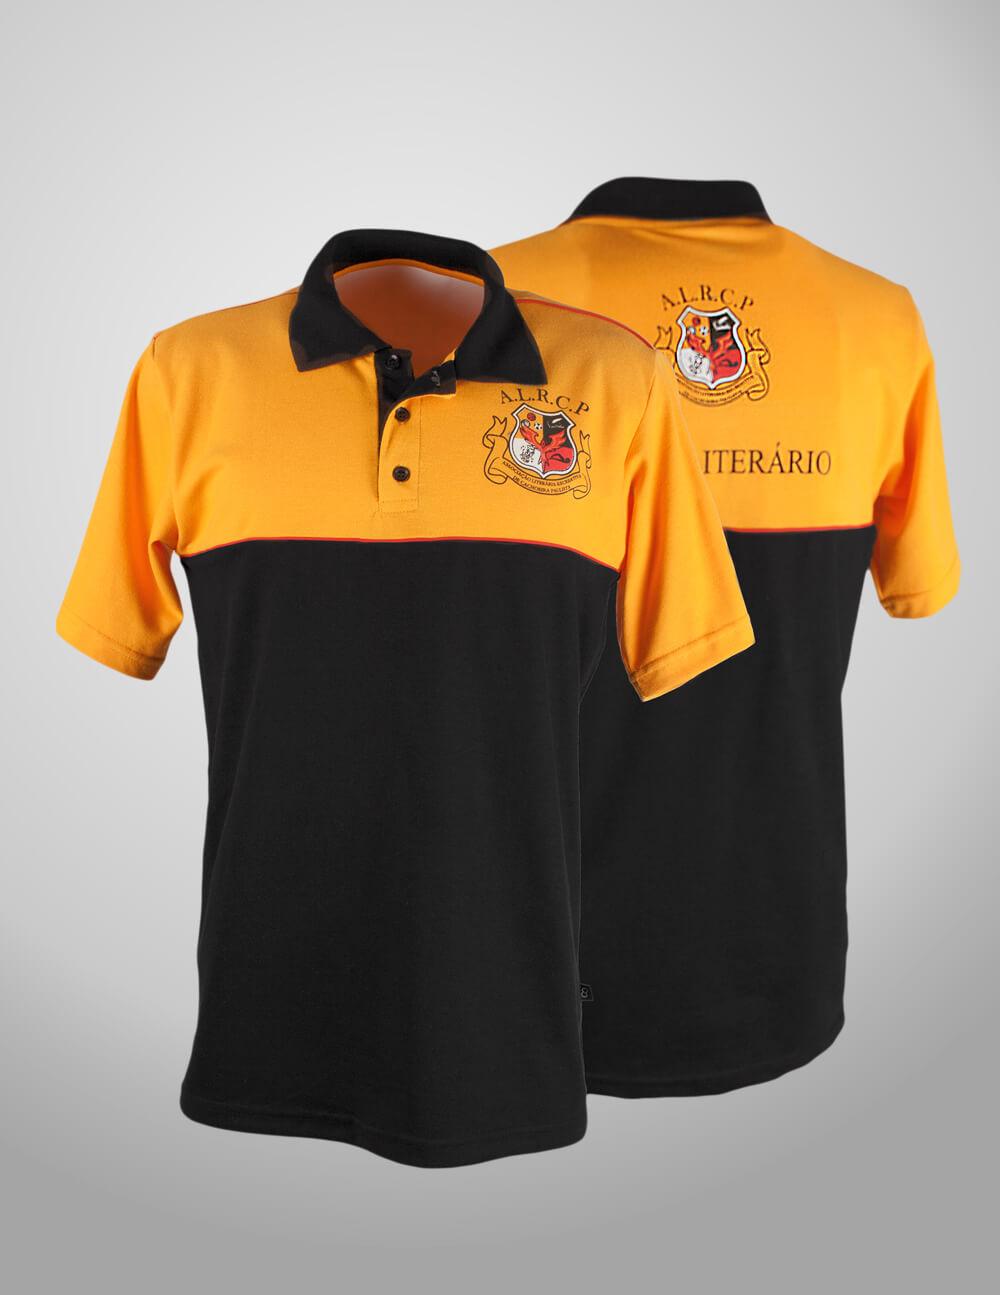 007a650973bdb Uniformes Campagna – Camisa Polo